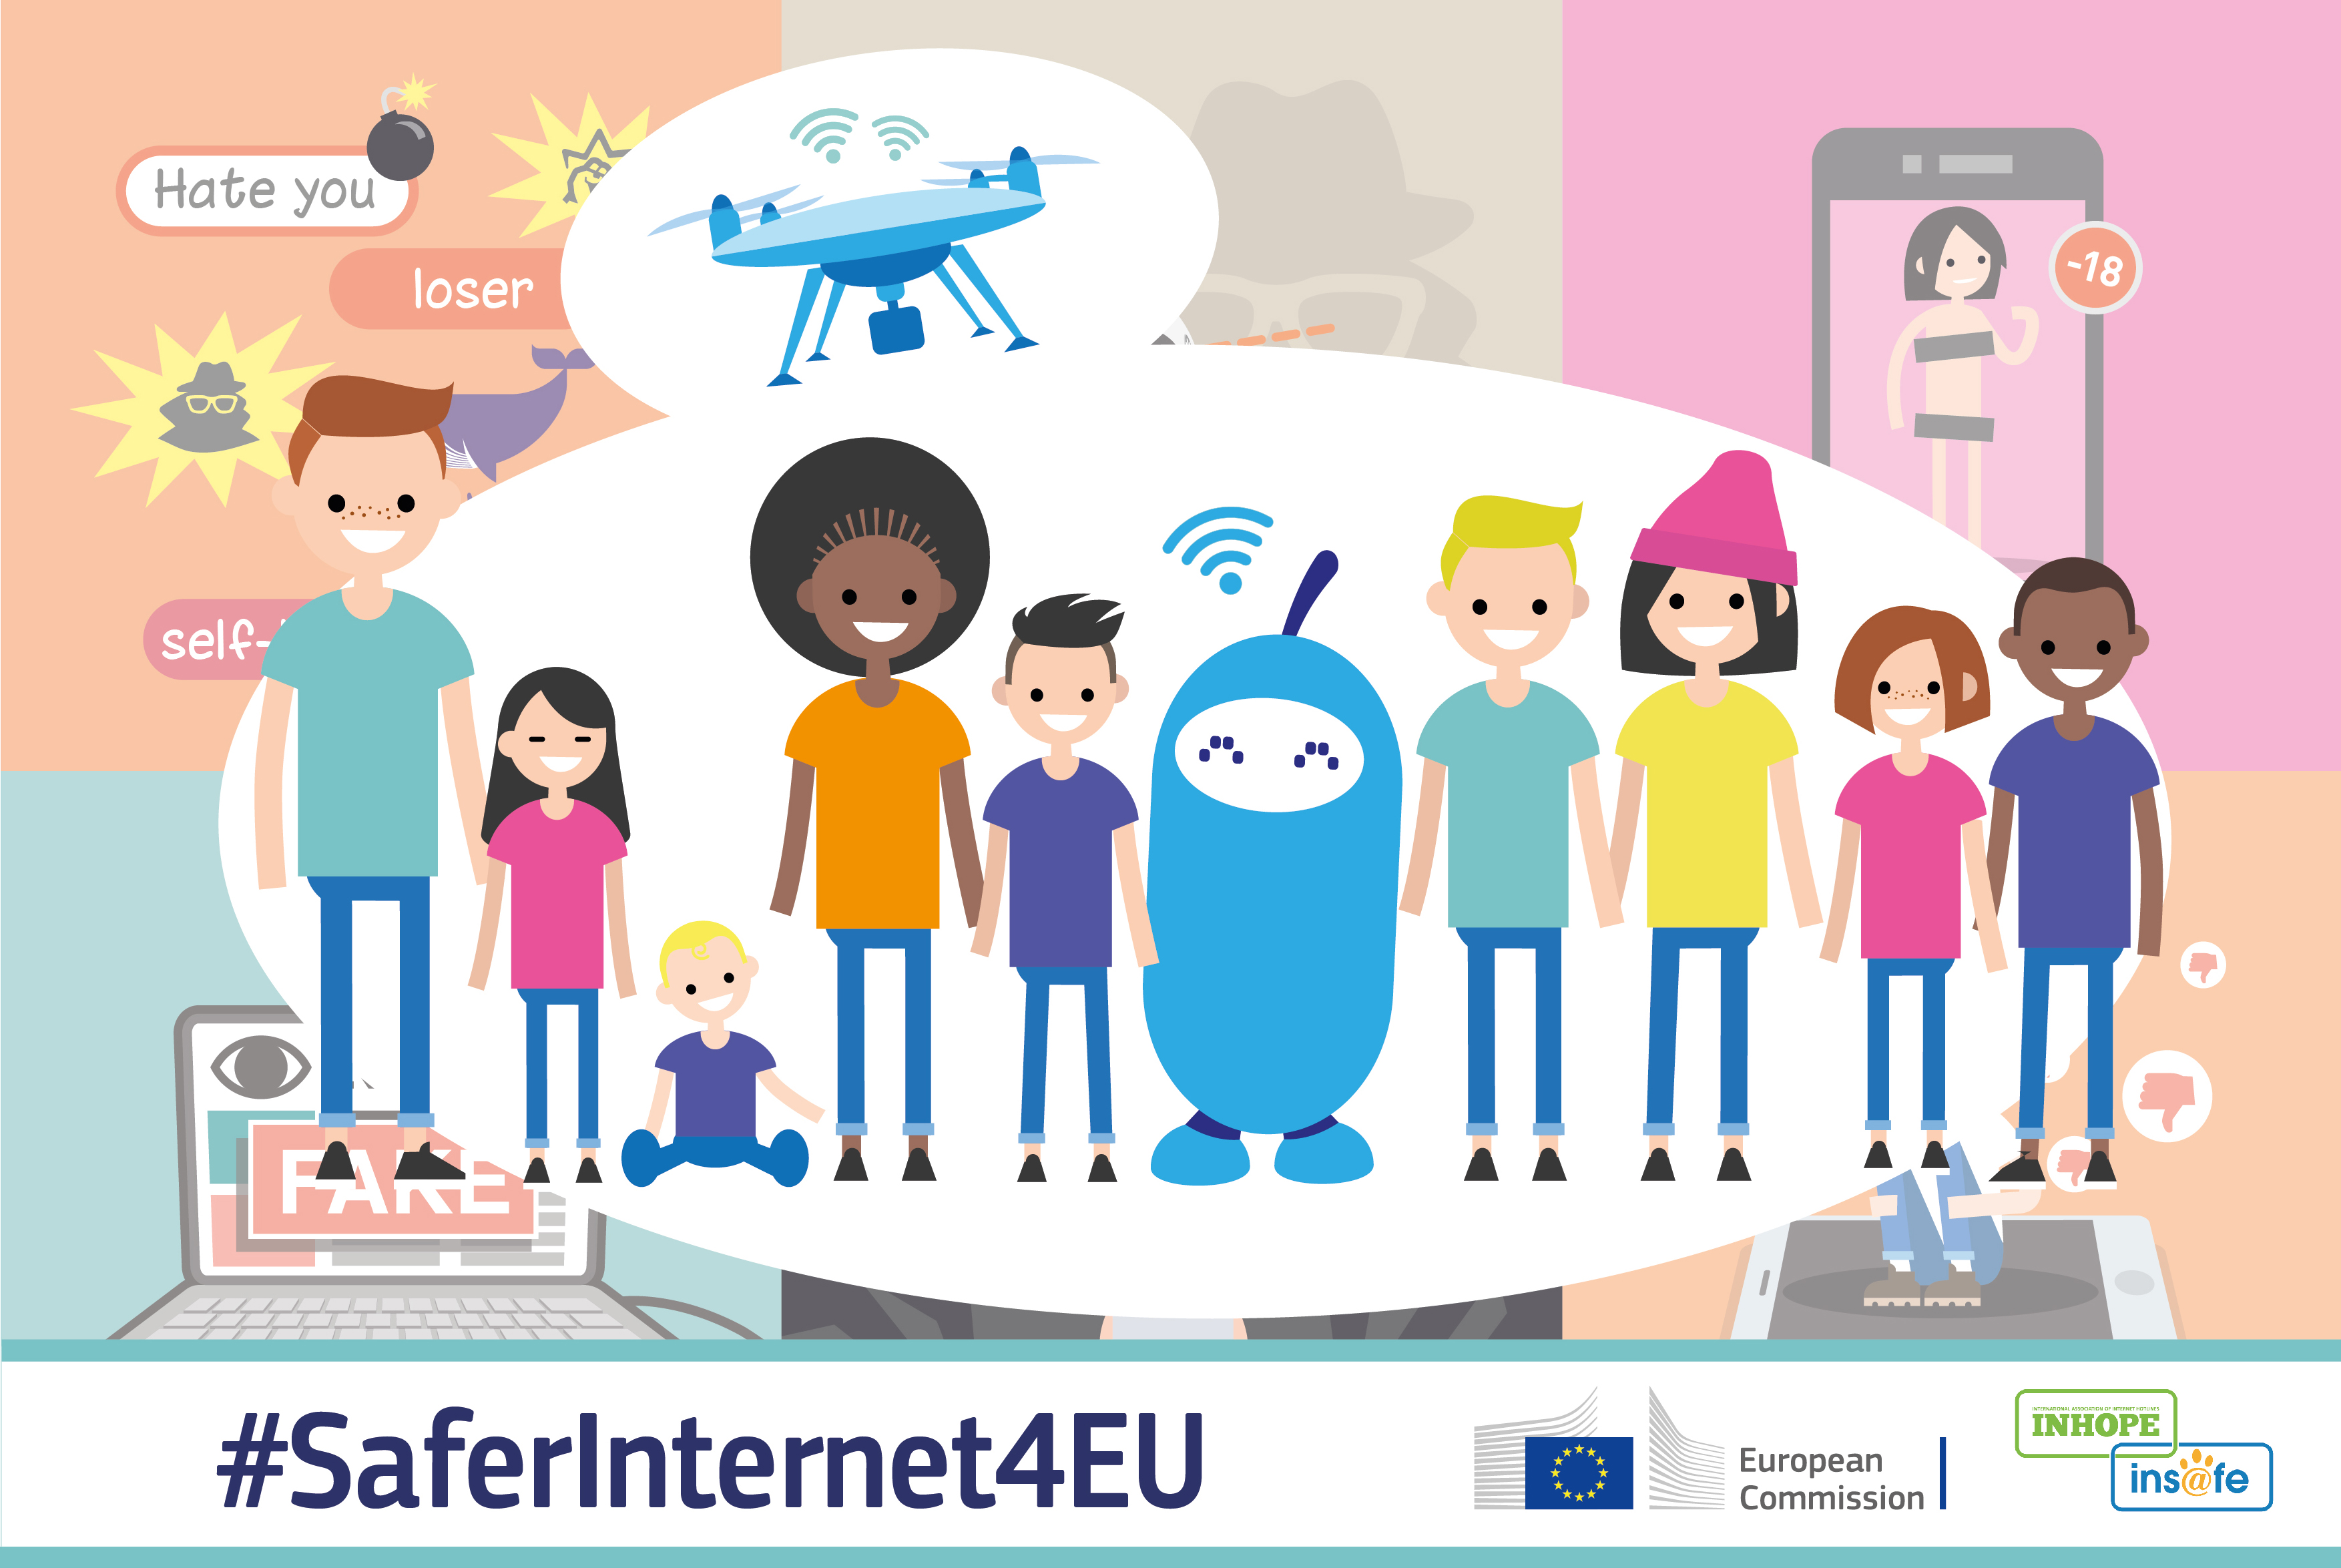 Safer Internet Award